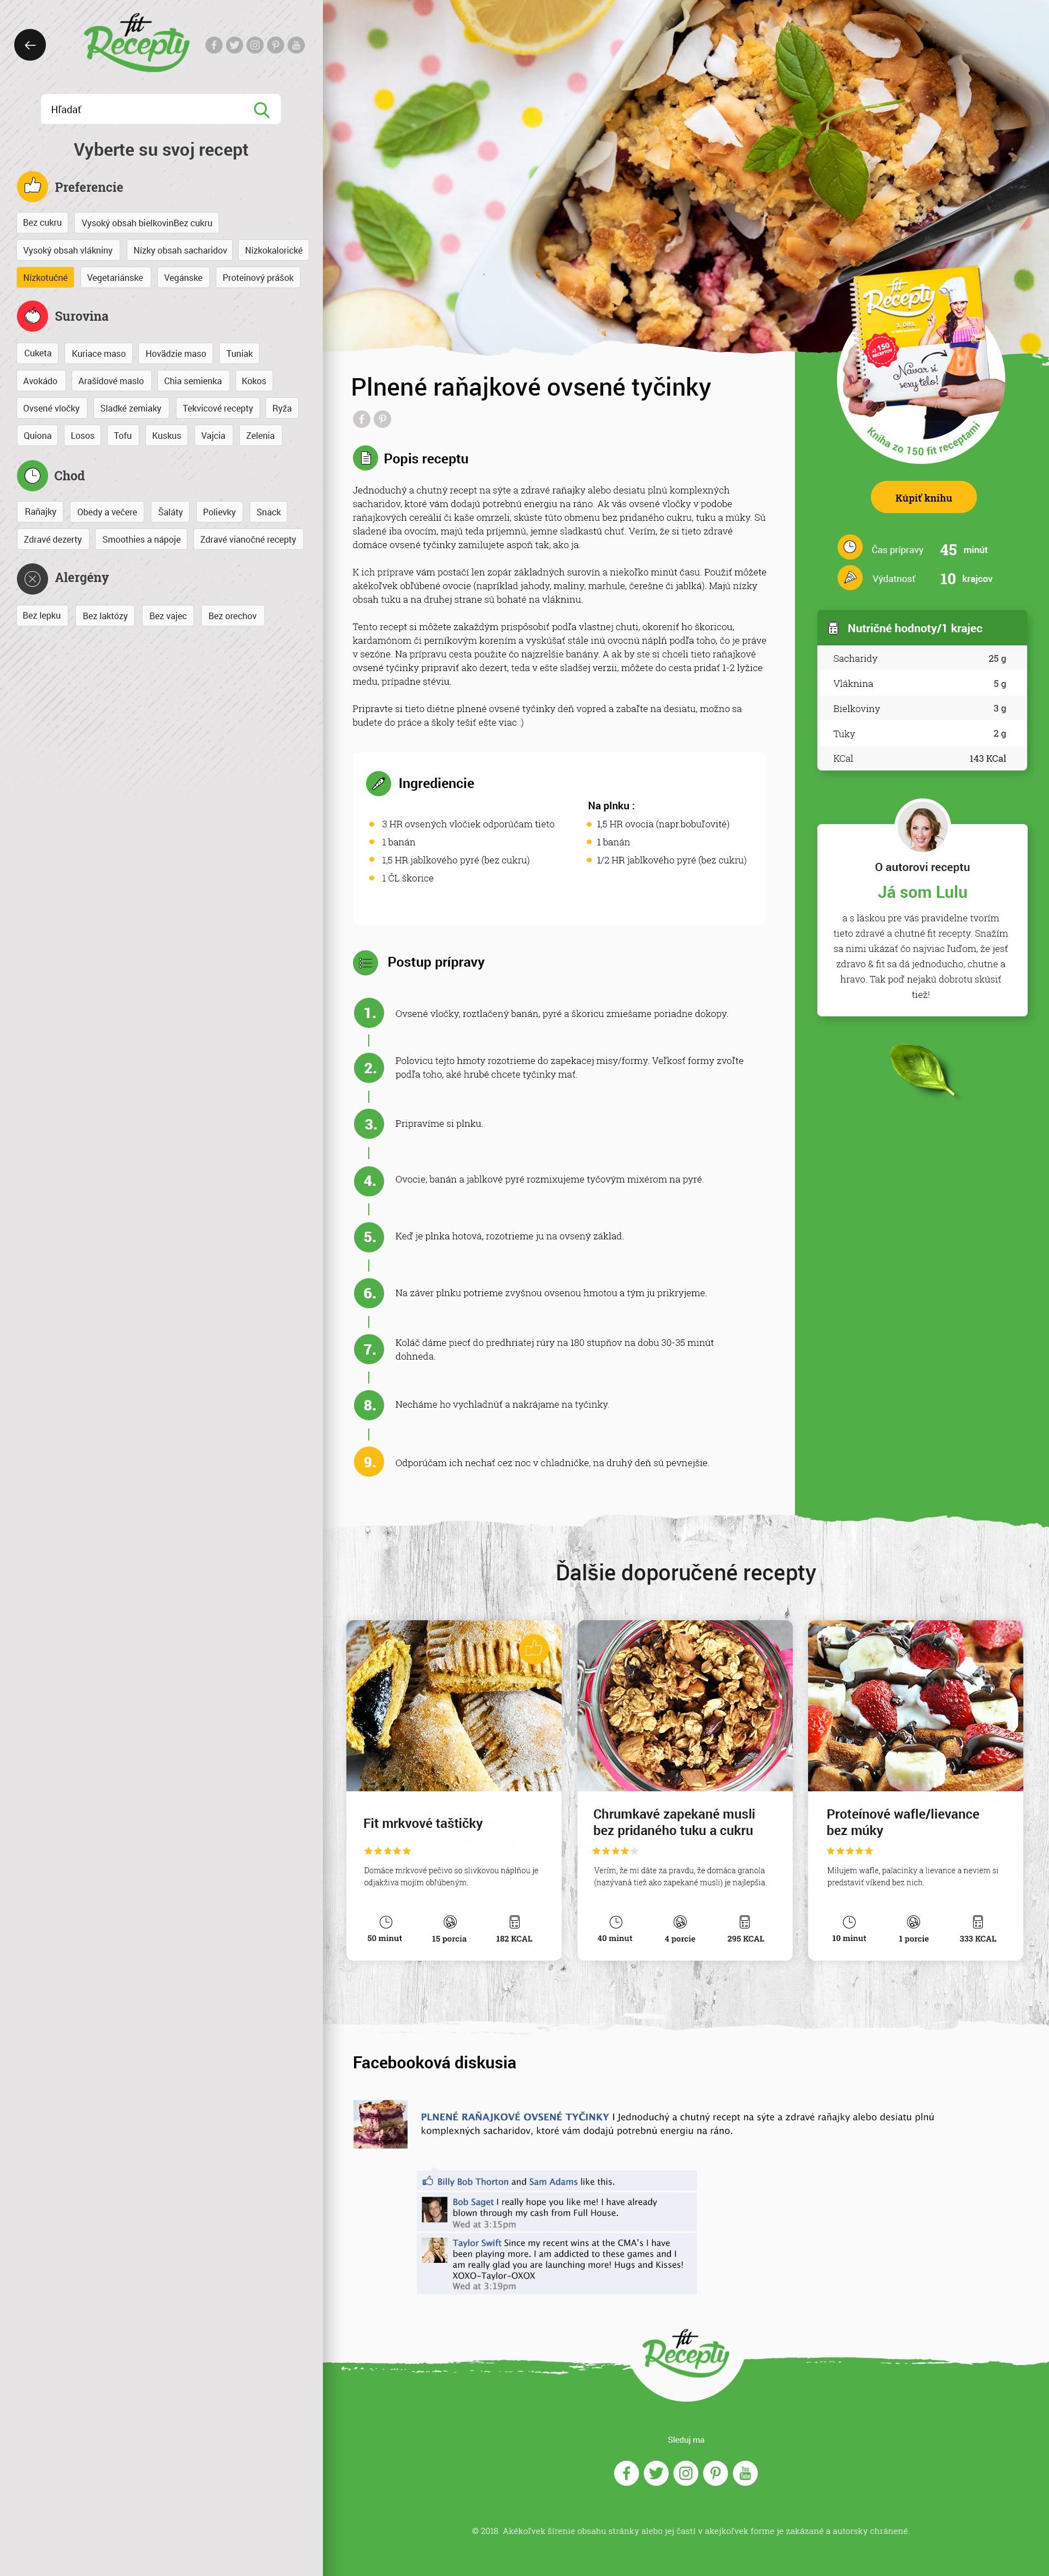 Healthy recipe website needs a modern redesign